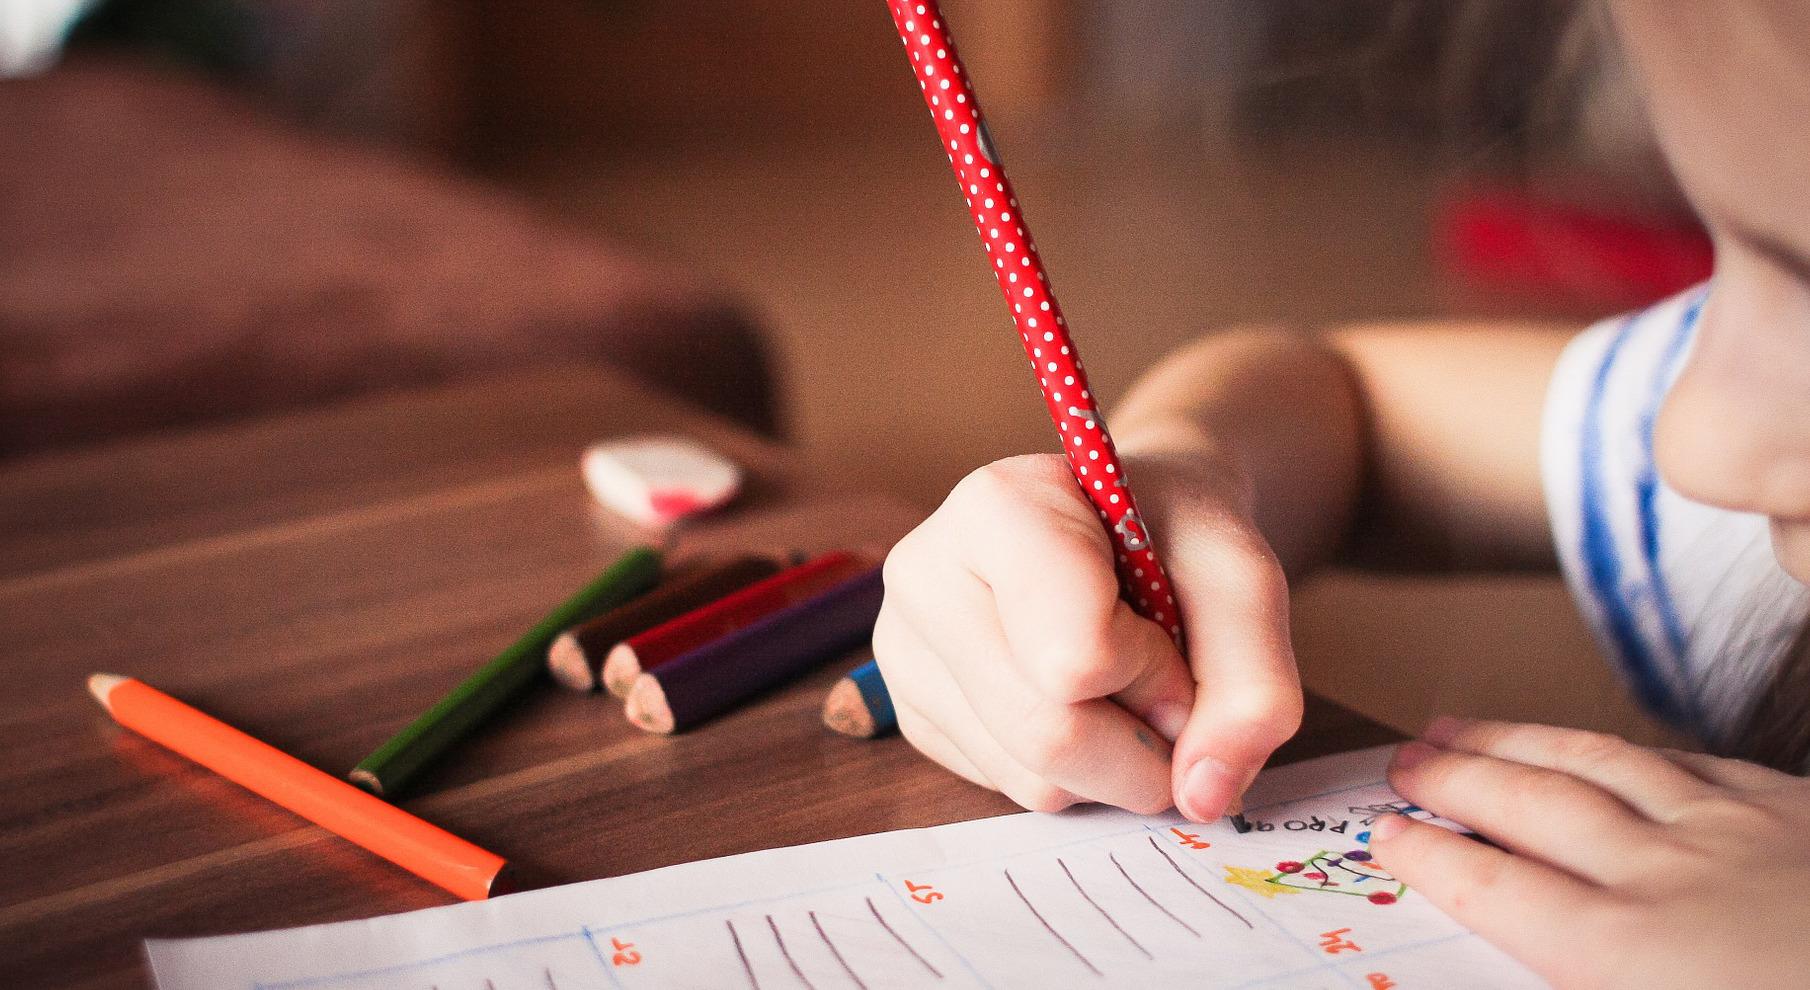 child-865116_1920_640_350, picjumbo_com via pixabay, CC0, bearbeitet.